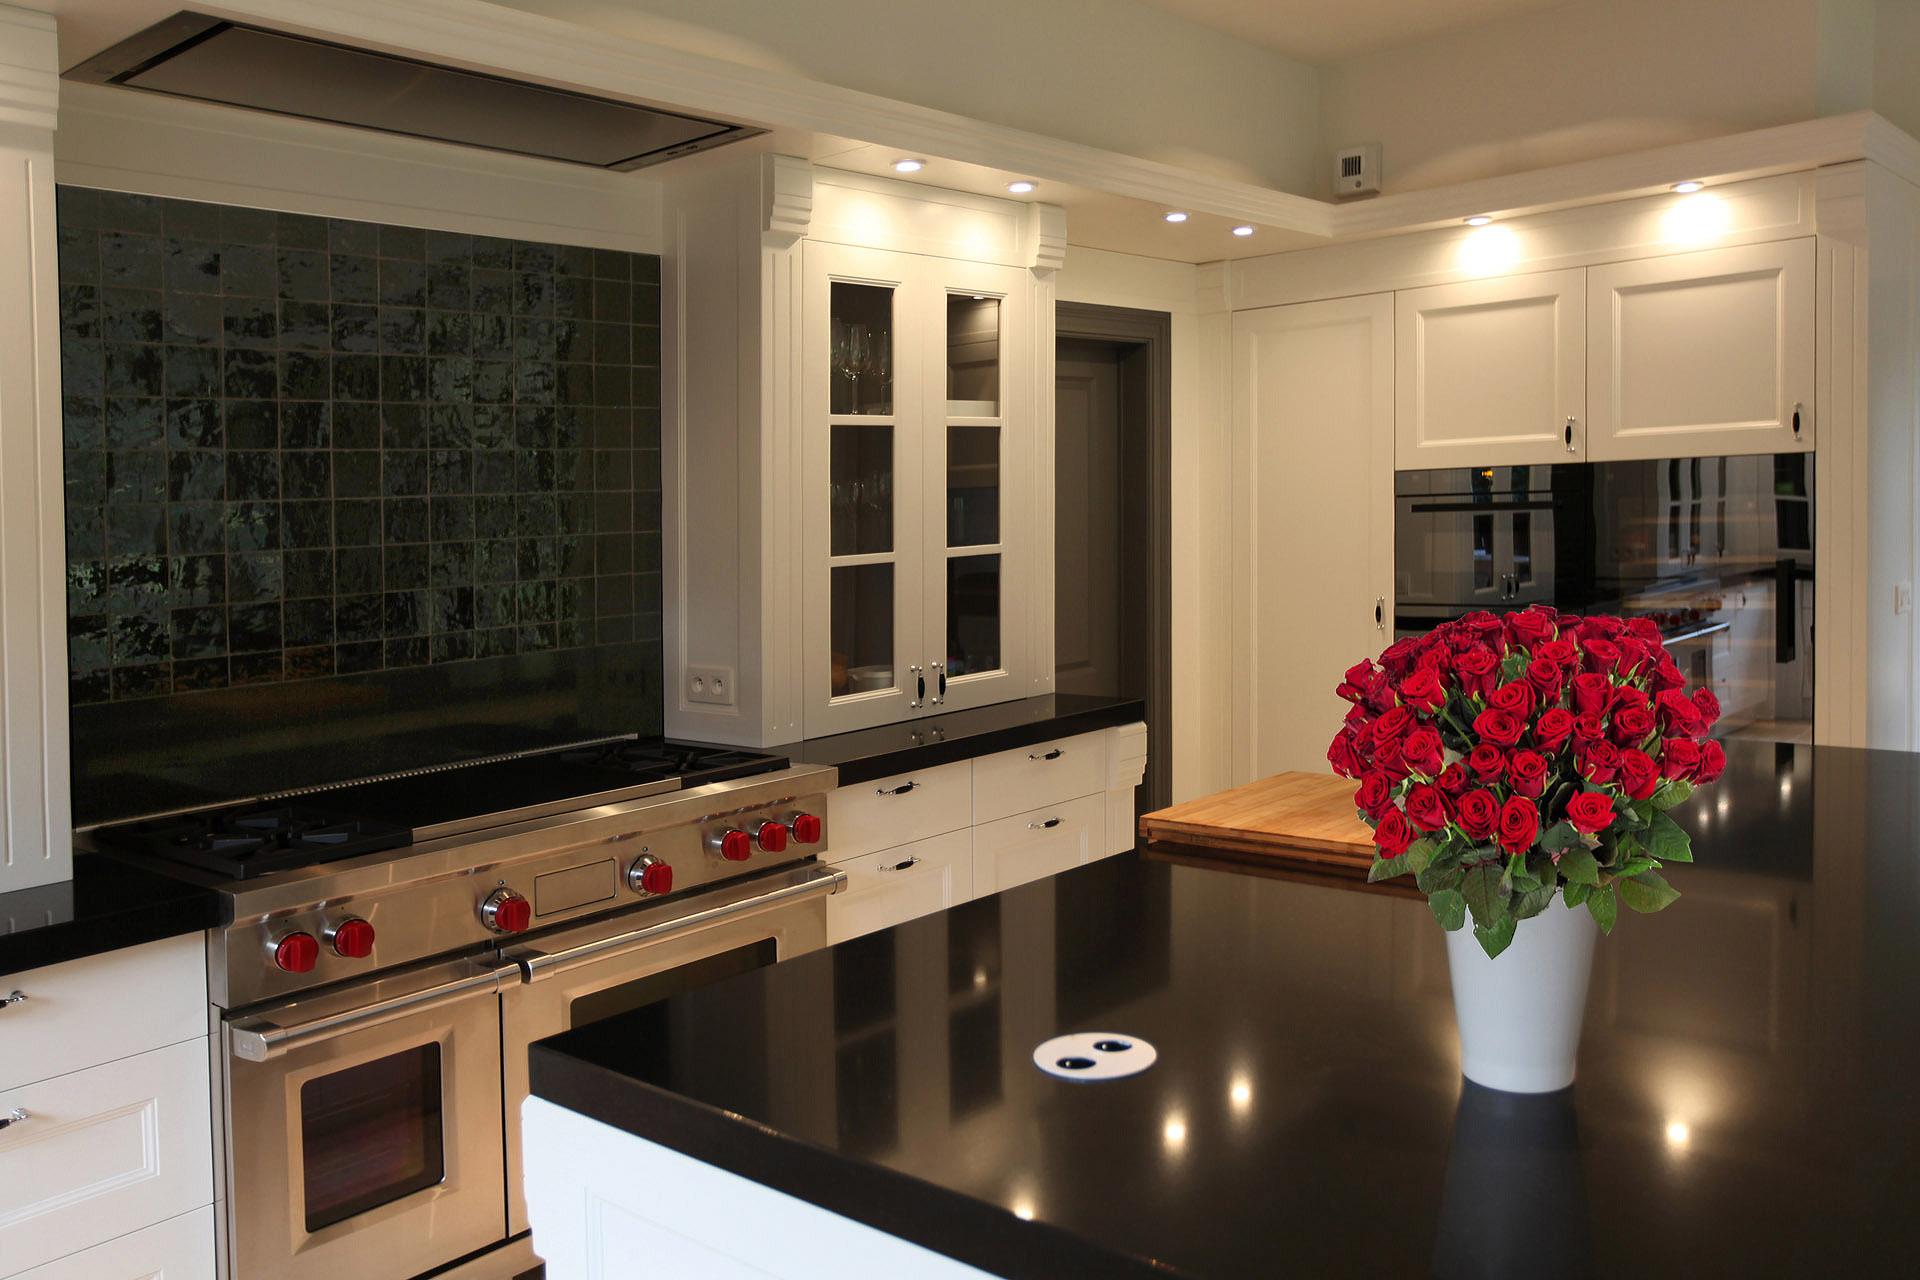 Landelijke keuken Kapellen - Marcotte Style